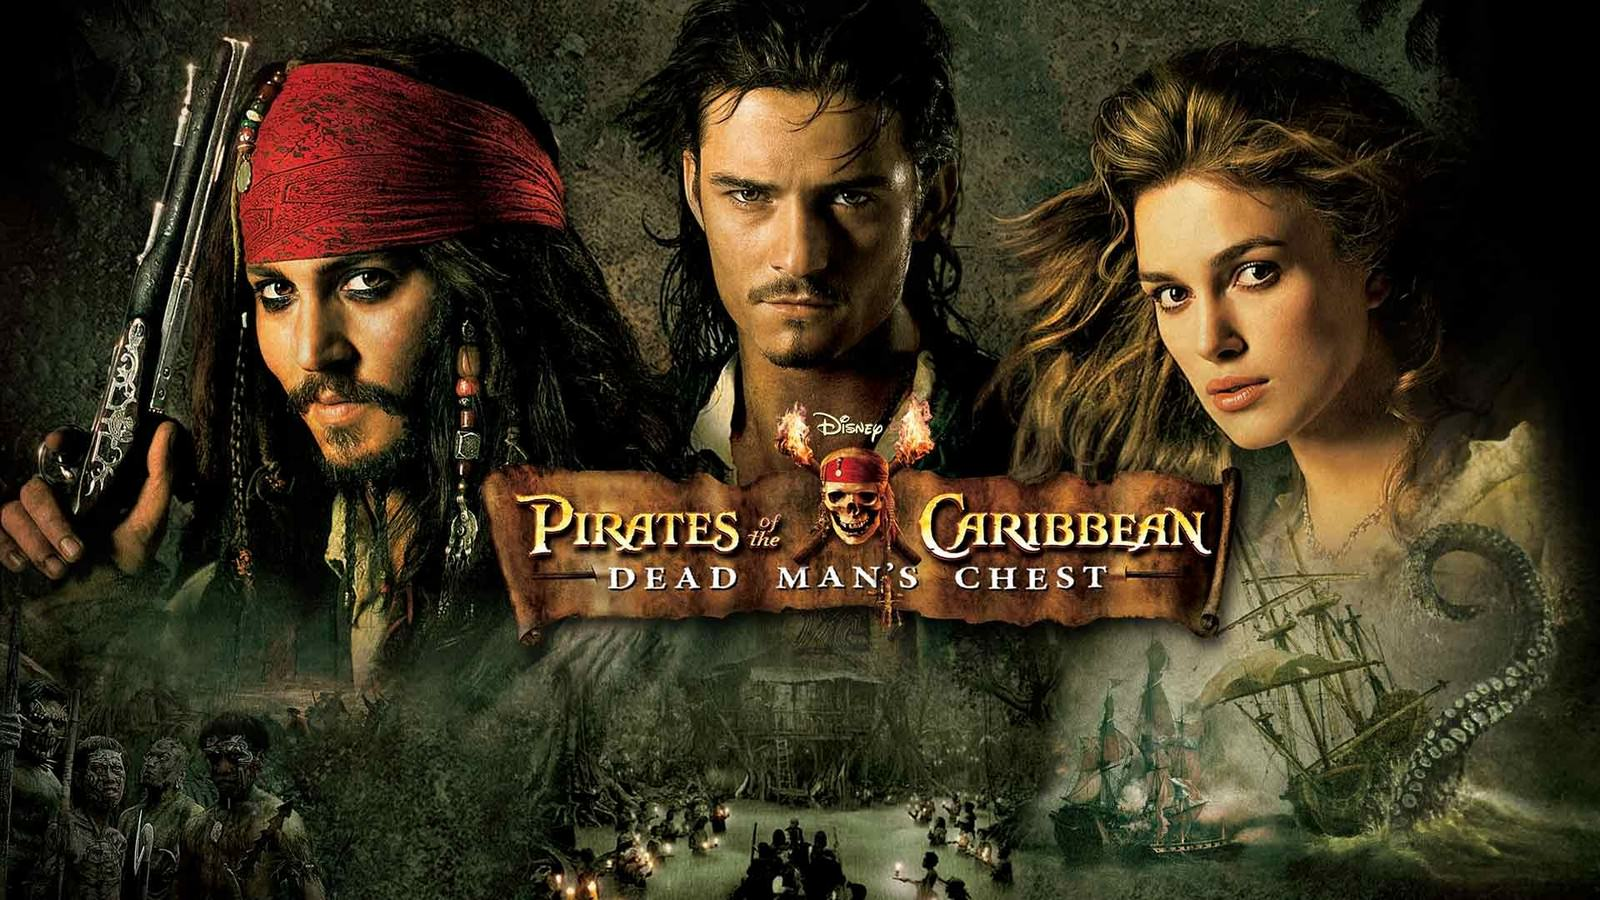 Movie, Pirates of the Caribbean: Dead Man's Chest(美國, 2006年) / 神鬼奇航2:加勒比海盜(台灣) / 加勒比海盜:決戰魔盜王(香港) / 加勒比海盗2:聚魂棺(網路), 電影海報, 美國, 橫版